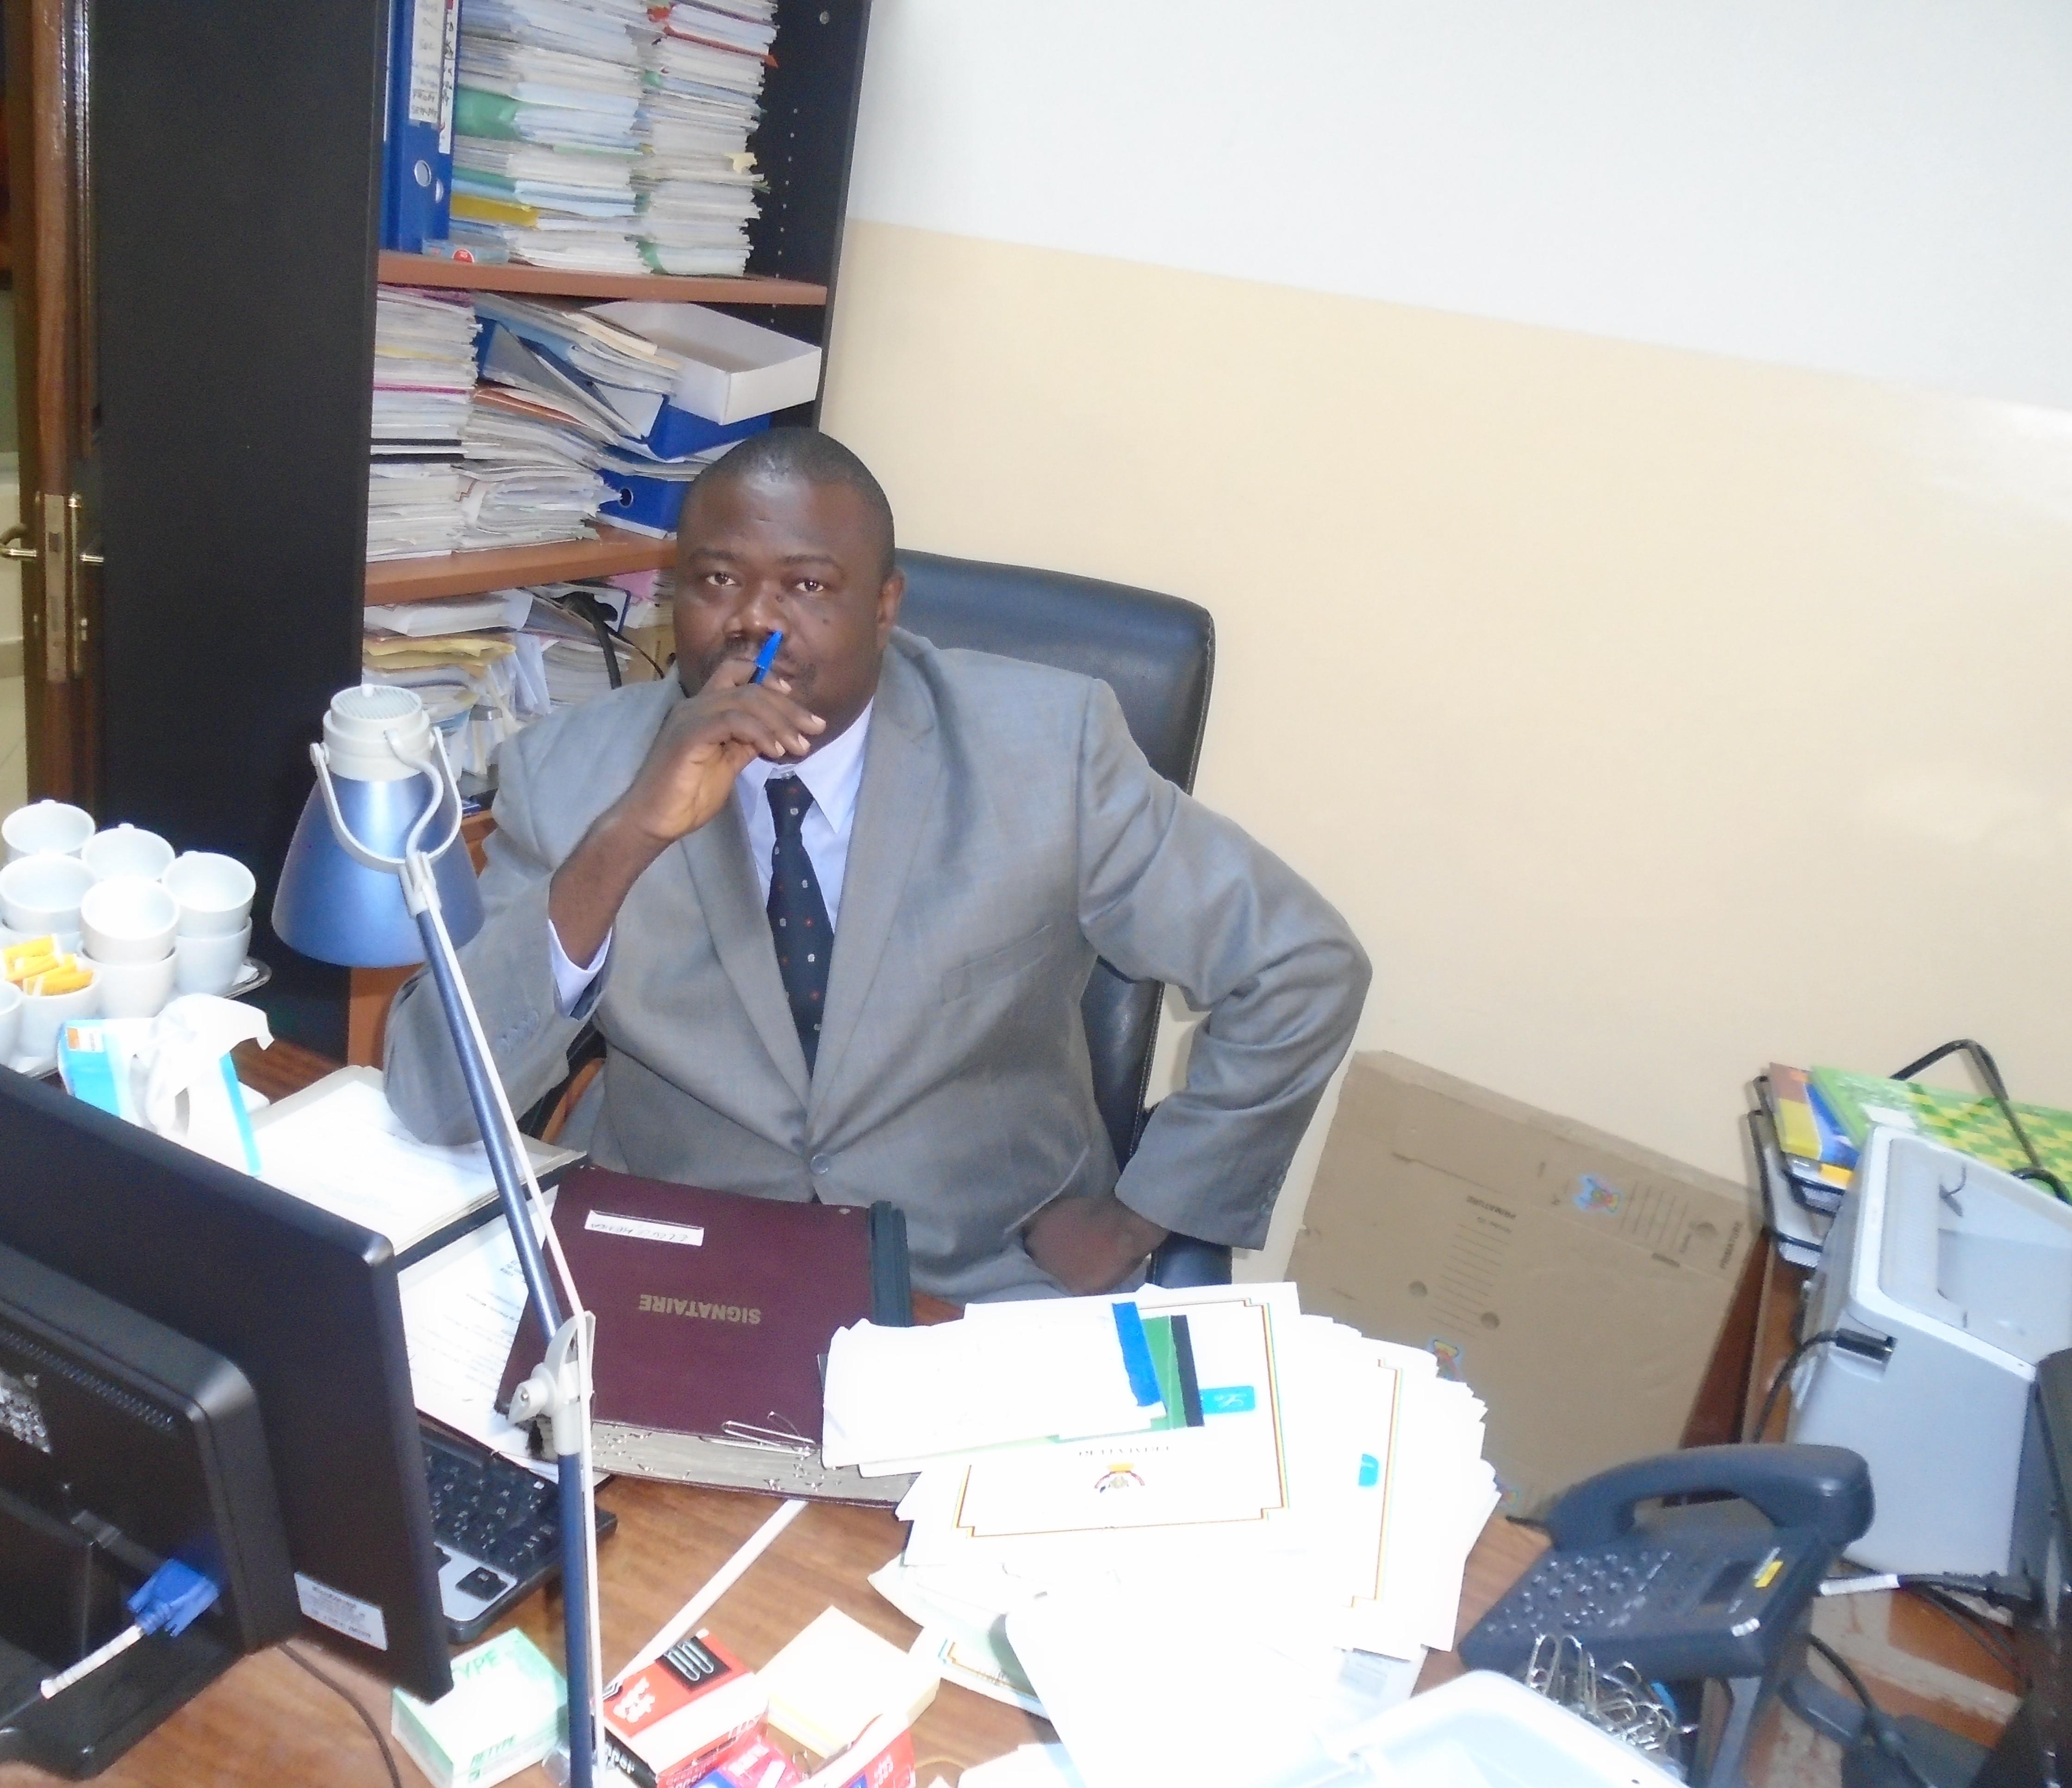 Laurent Thumba wa Thumba